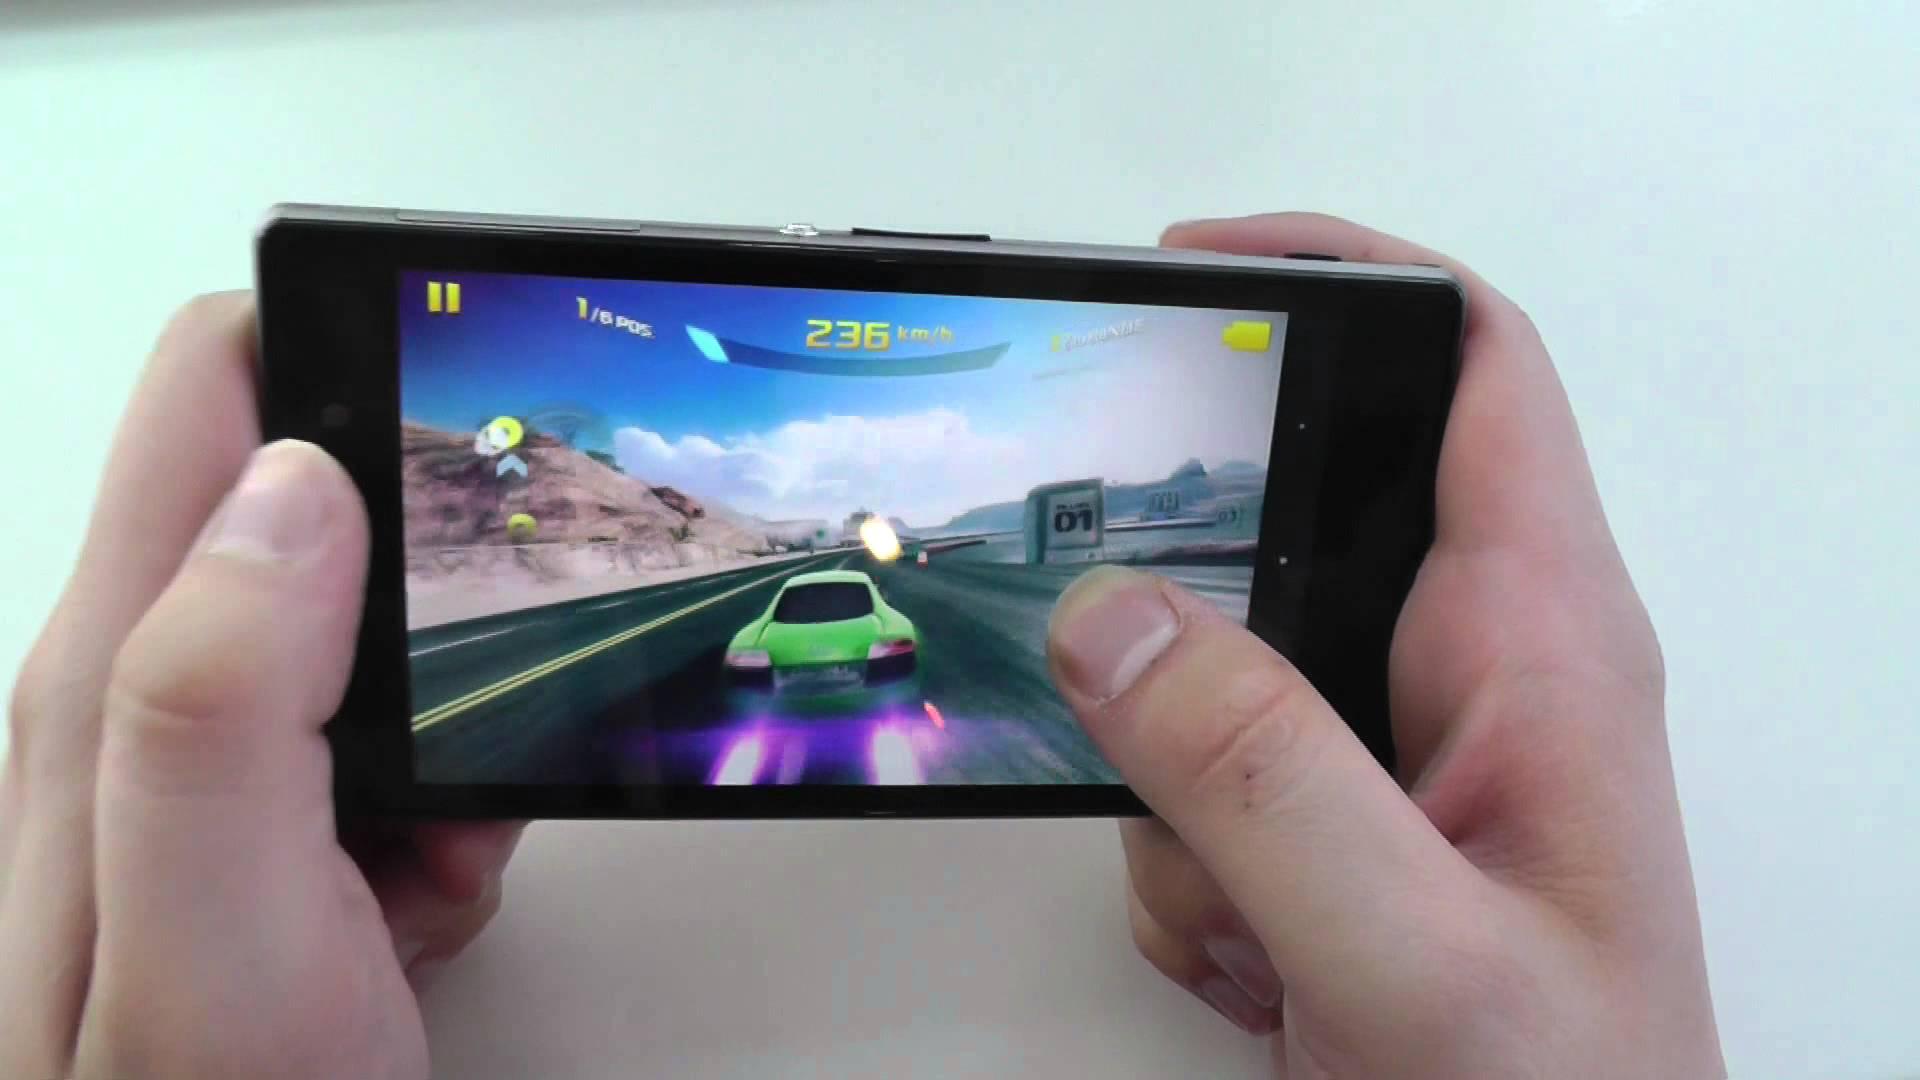 Sony Xperia Z1 ab sofort bei Amazon lieferbar für 649 Euro